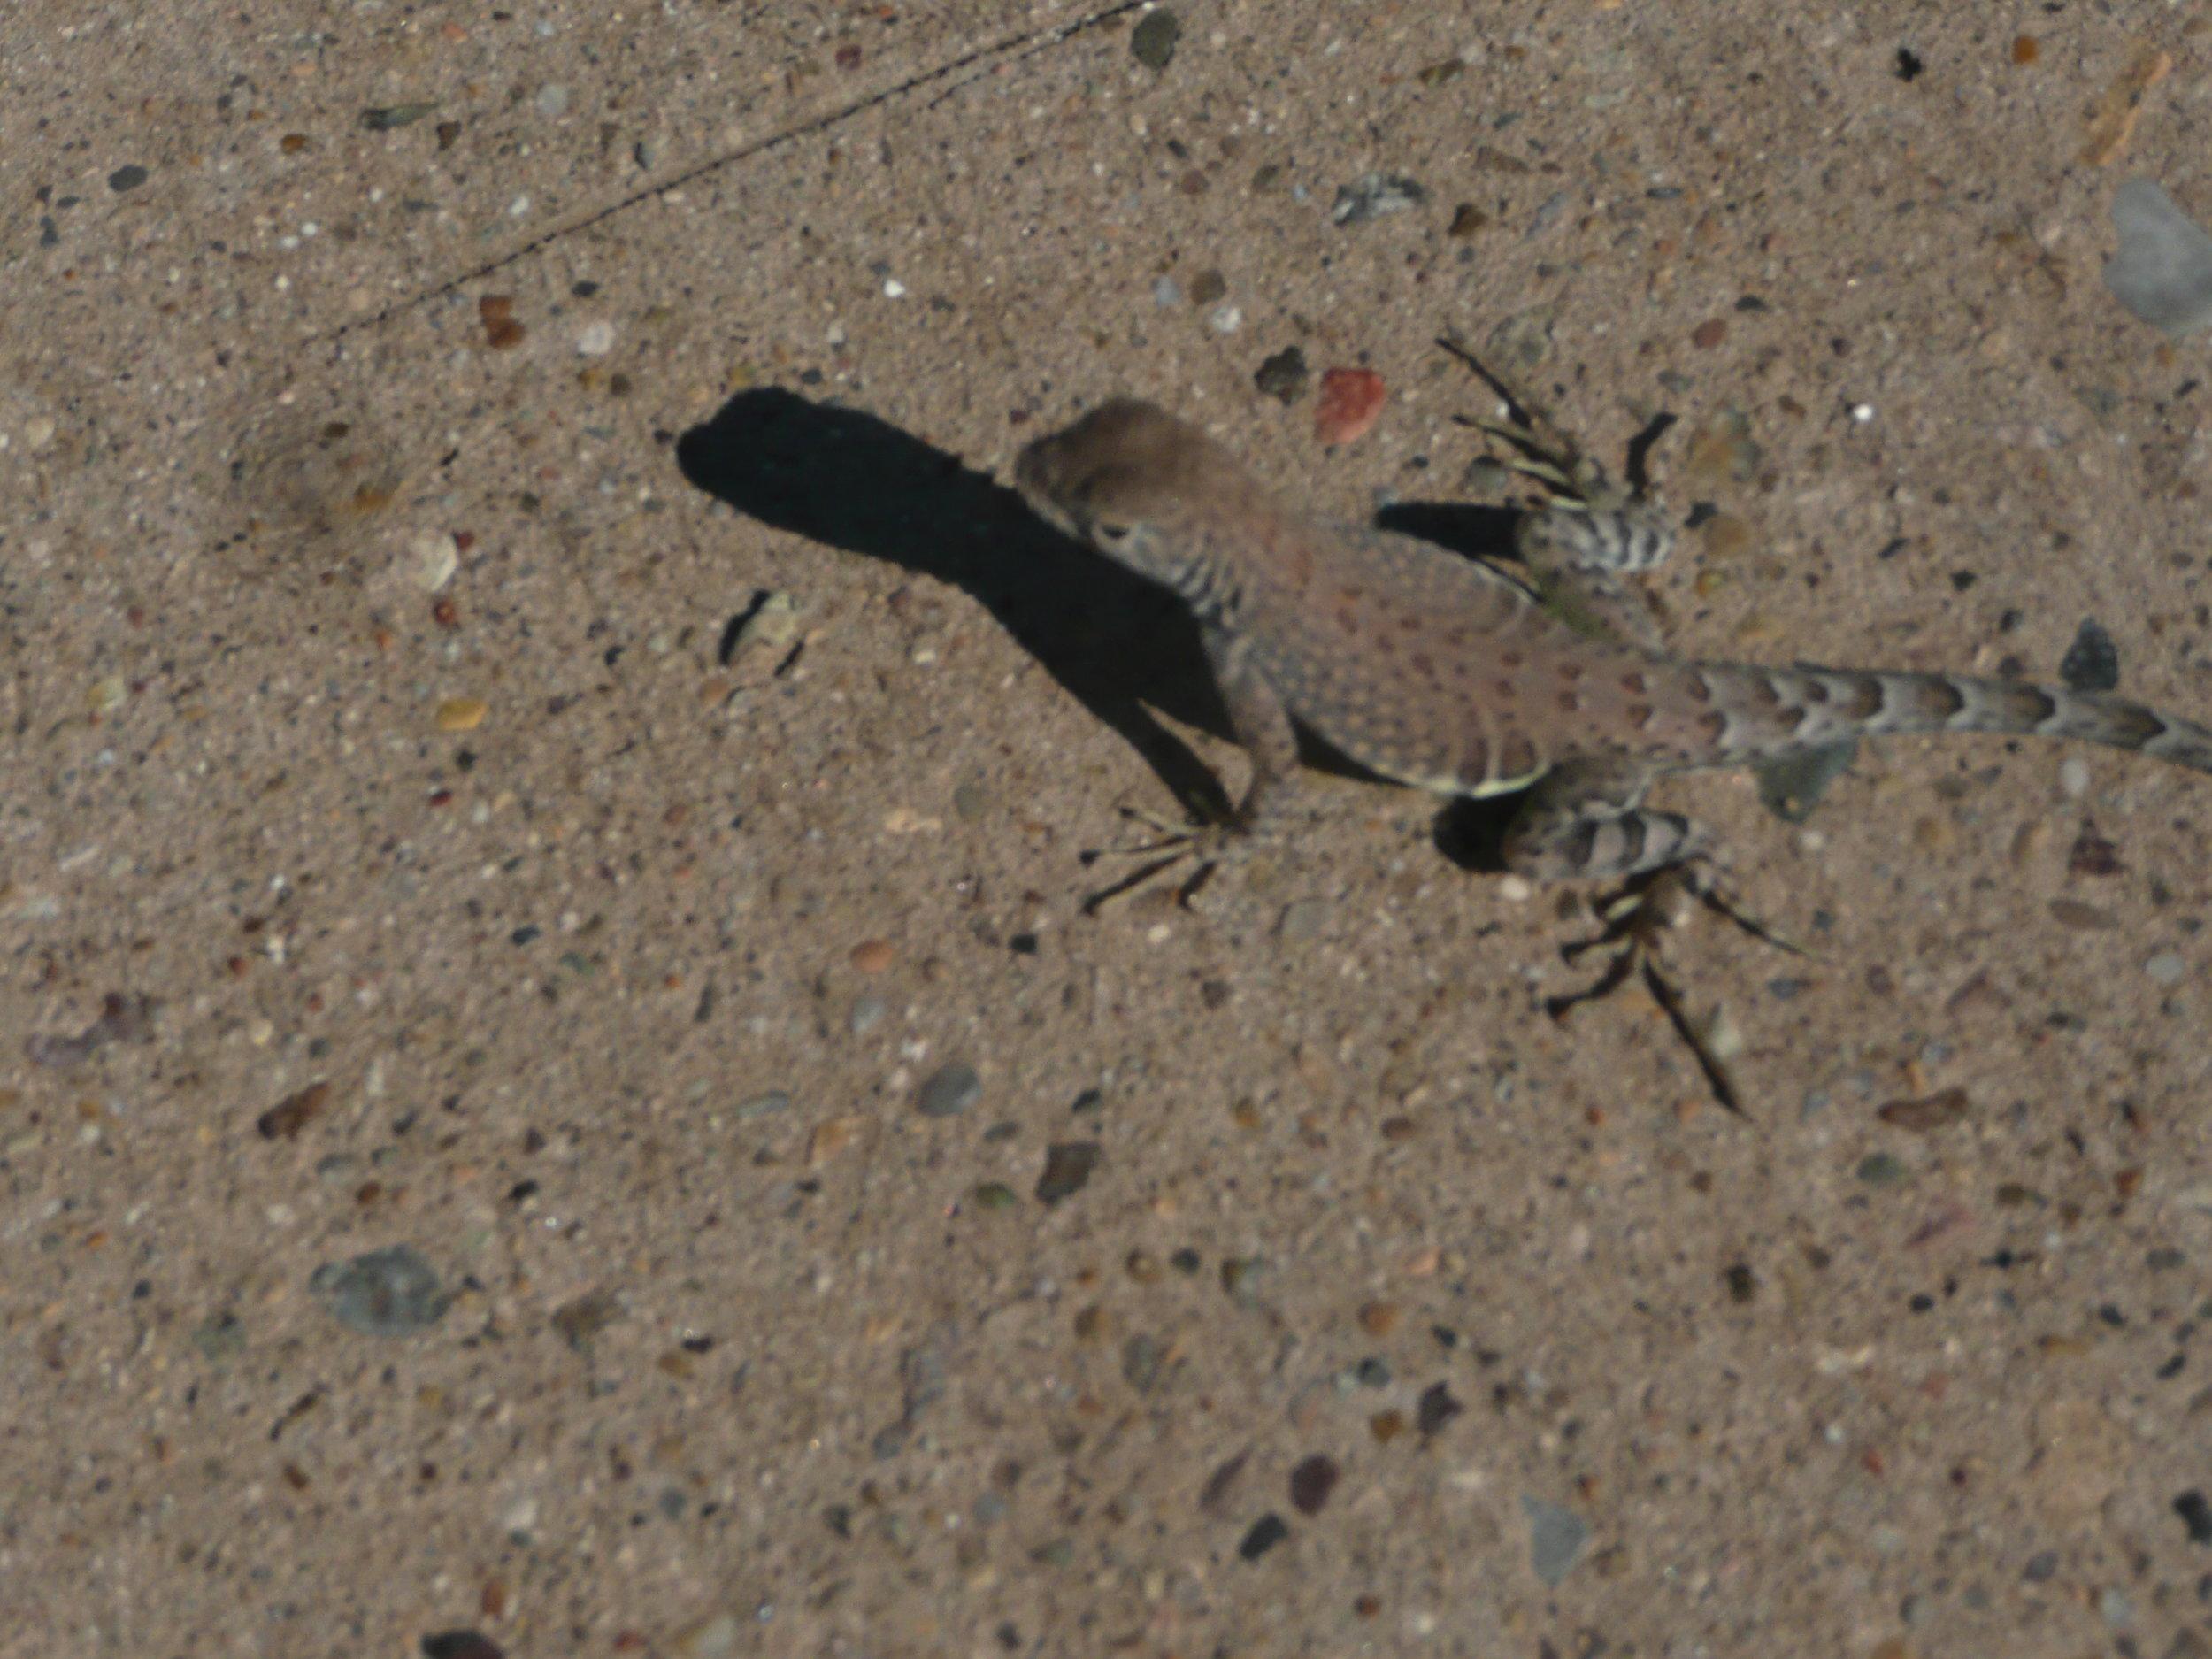 Wildlife in Big Bend National Park